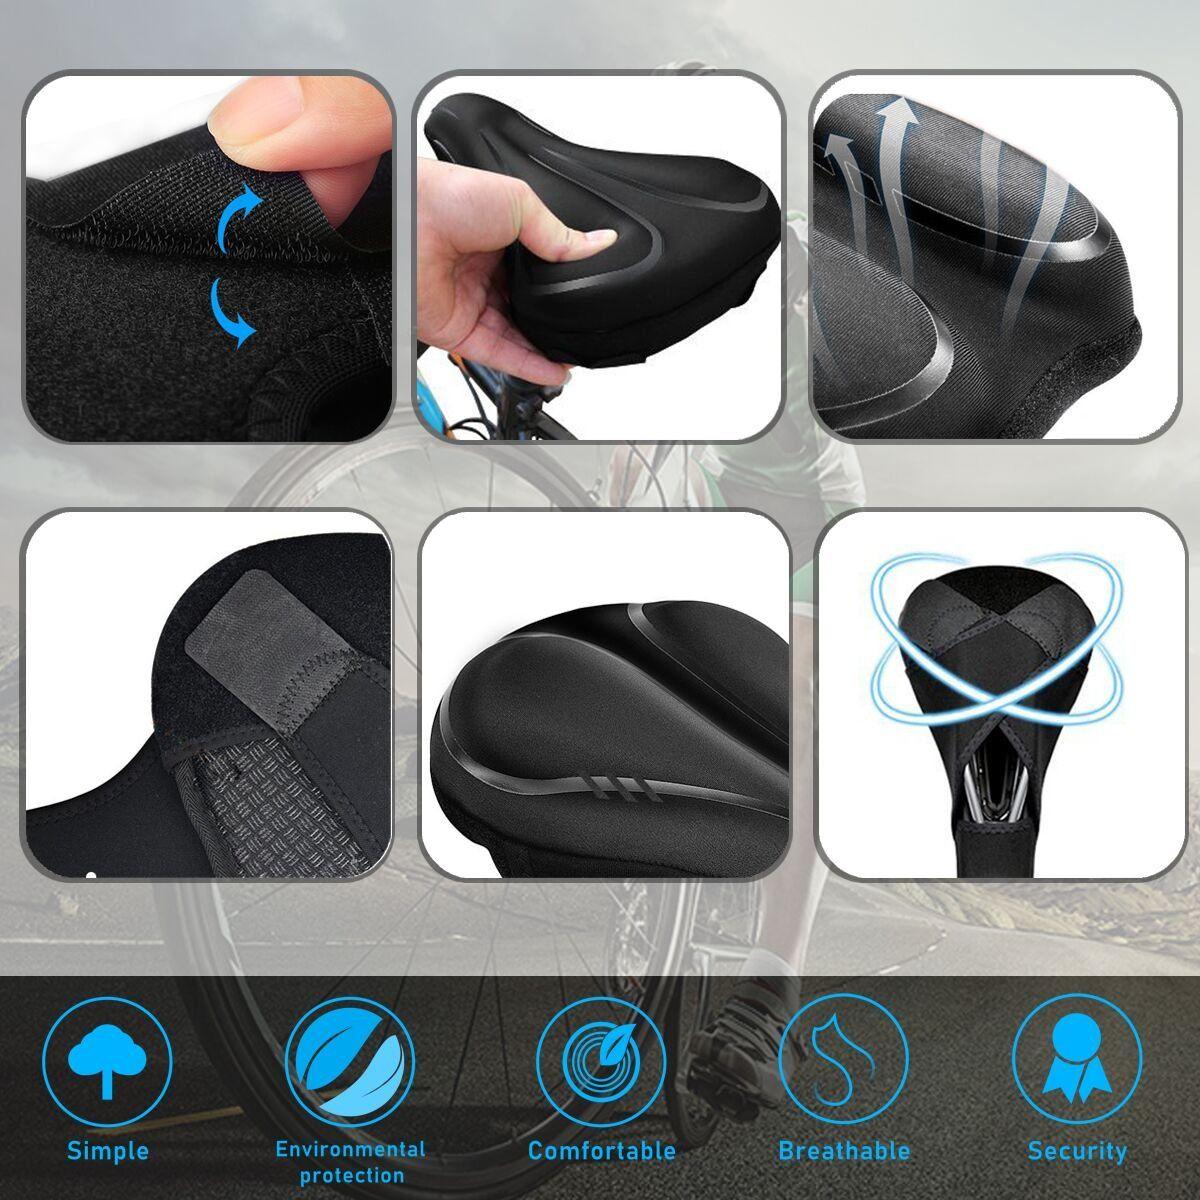 Sampow Premium Bike Gel Seat Cushion Cover Most Comfortable